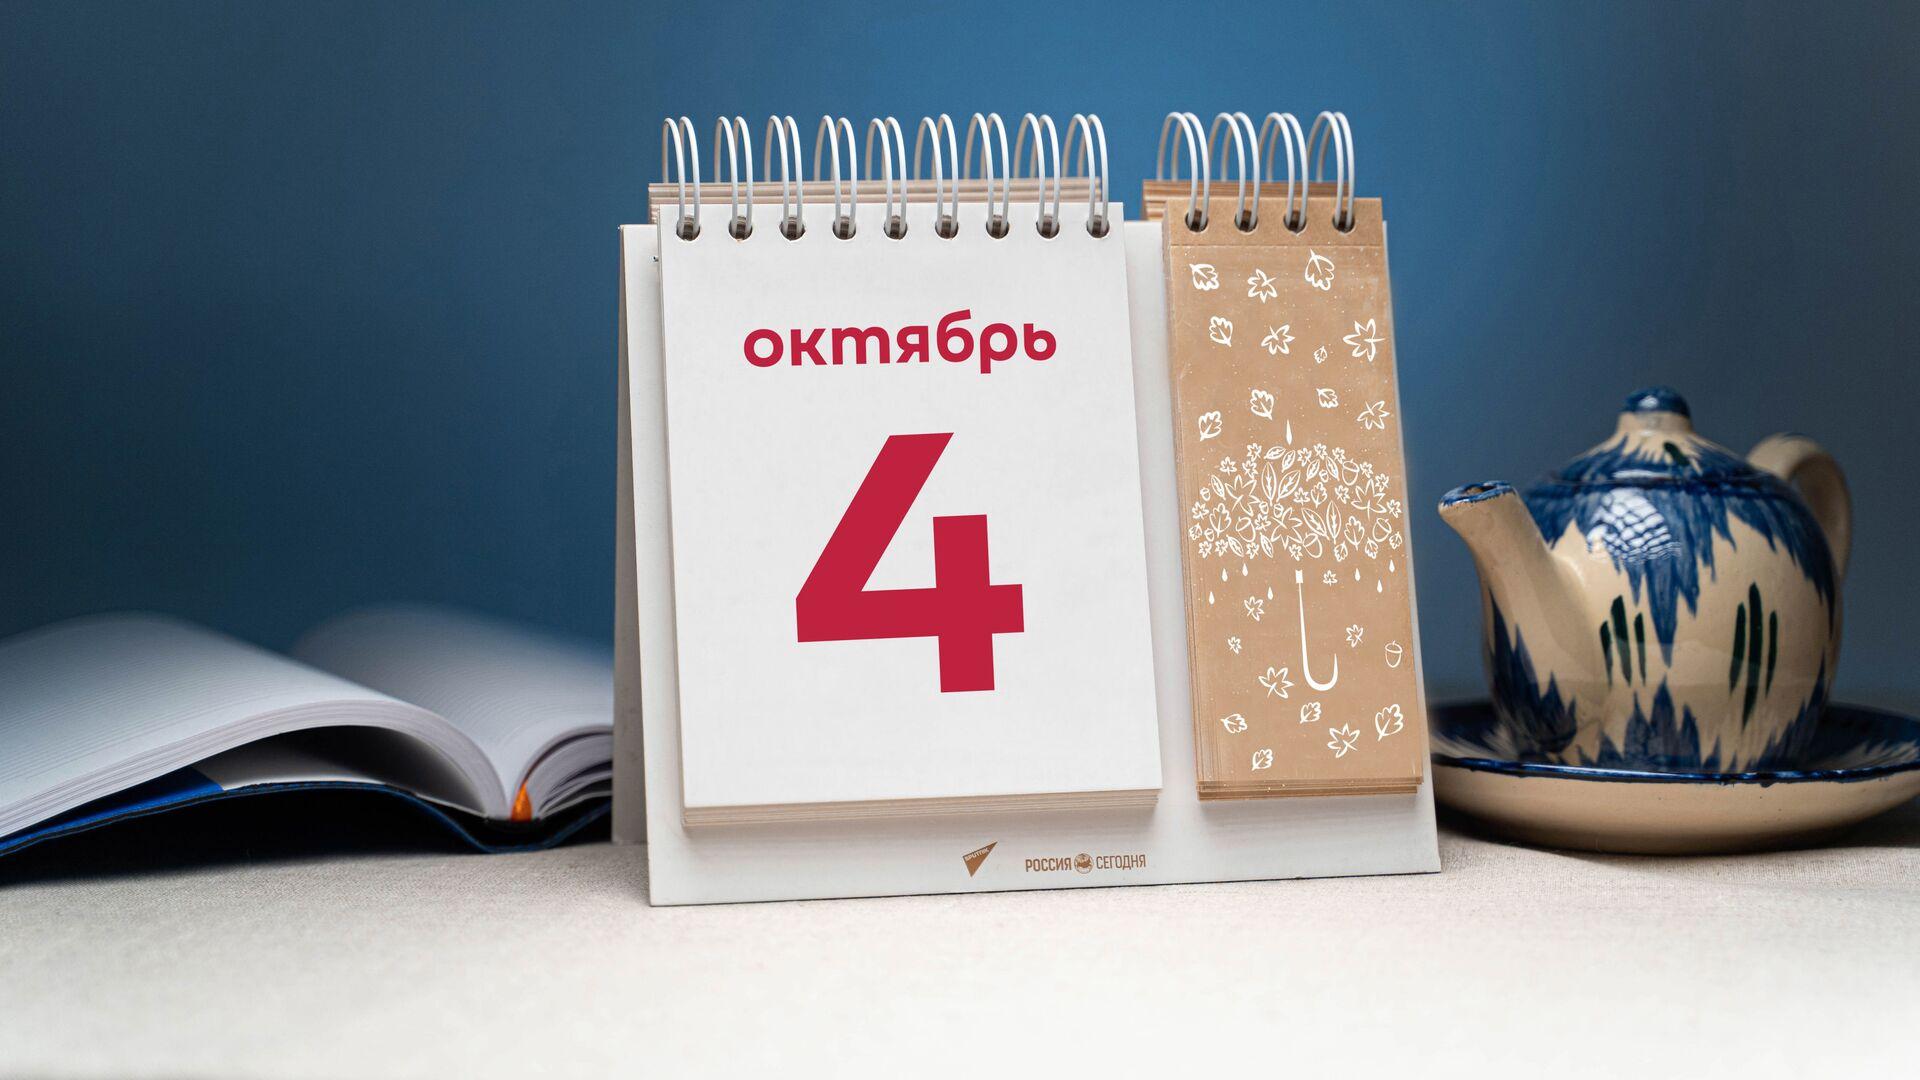 День 4 октября - Sputnik Тоҷикистон, 1920, 04.10.2021